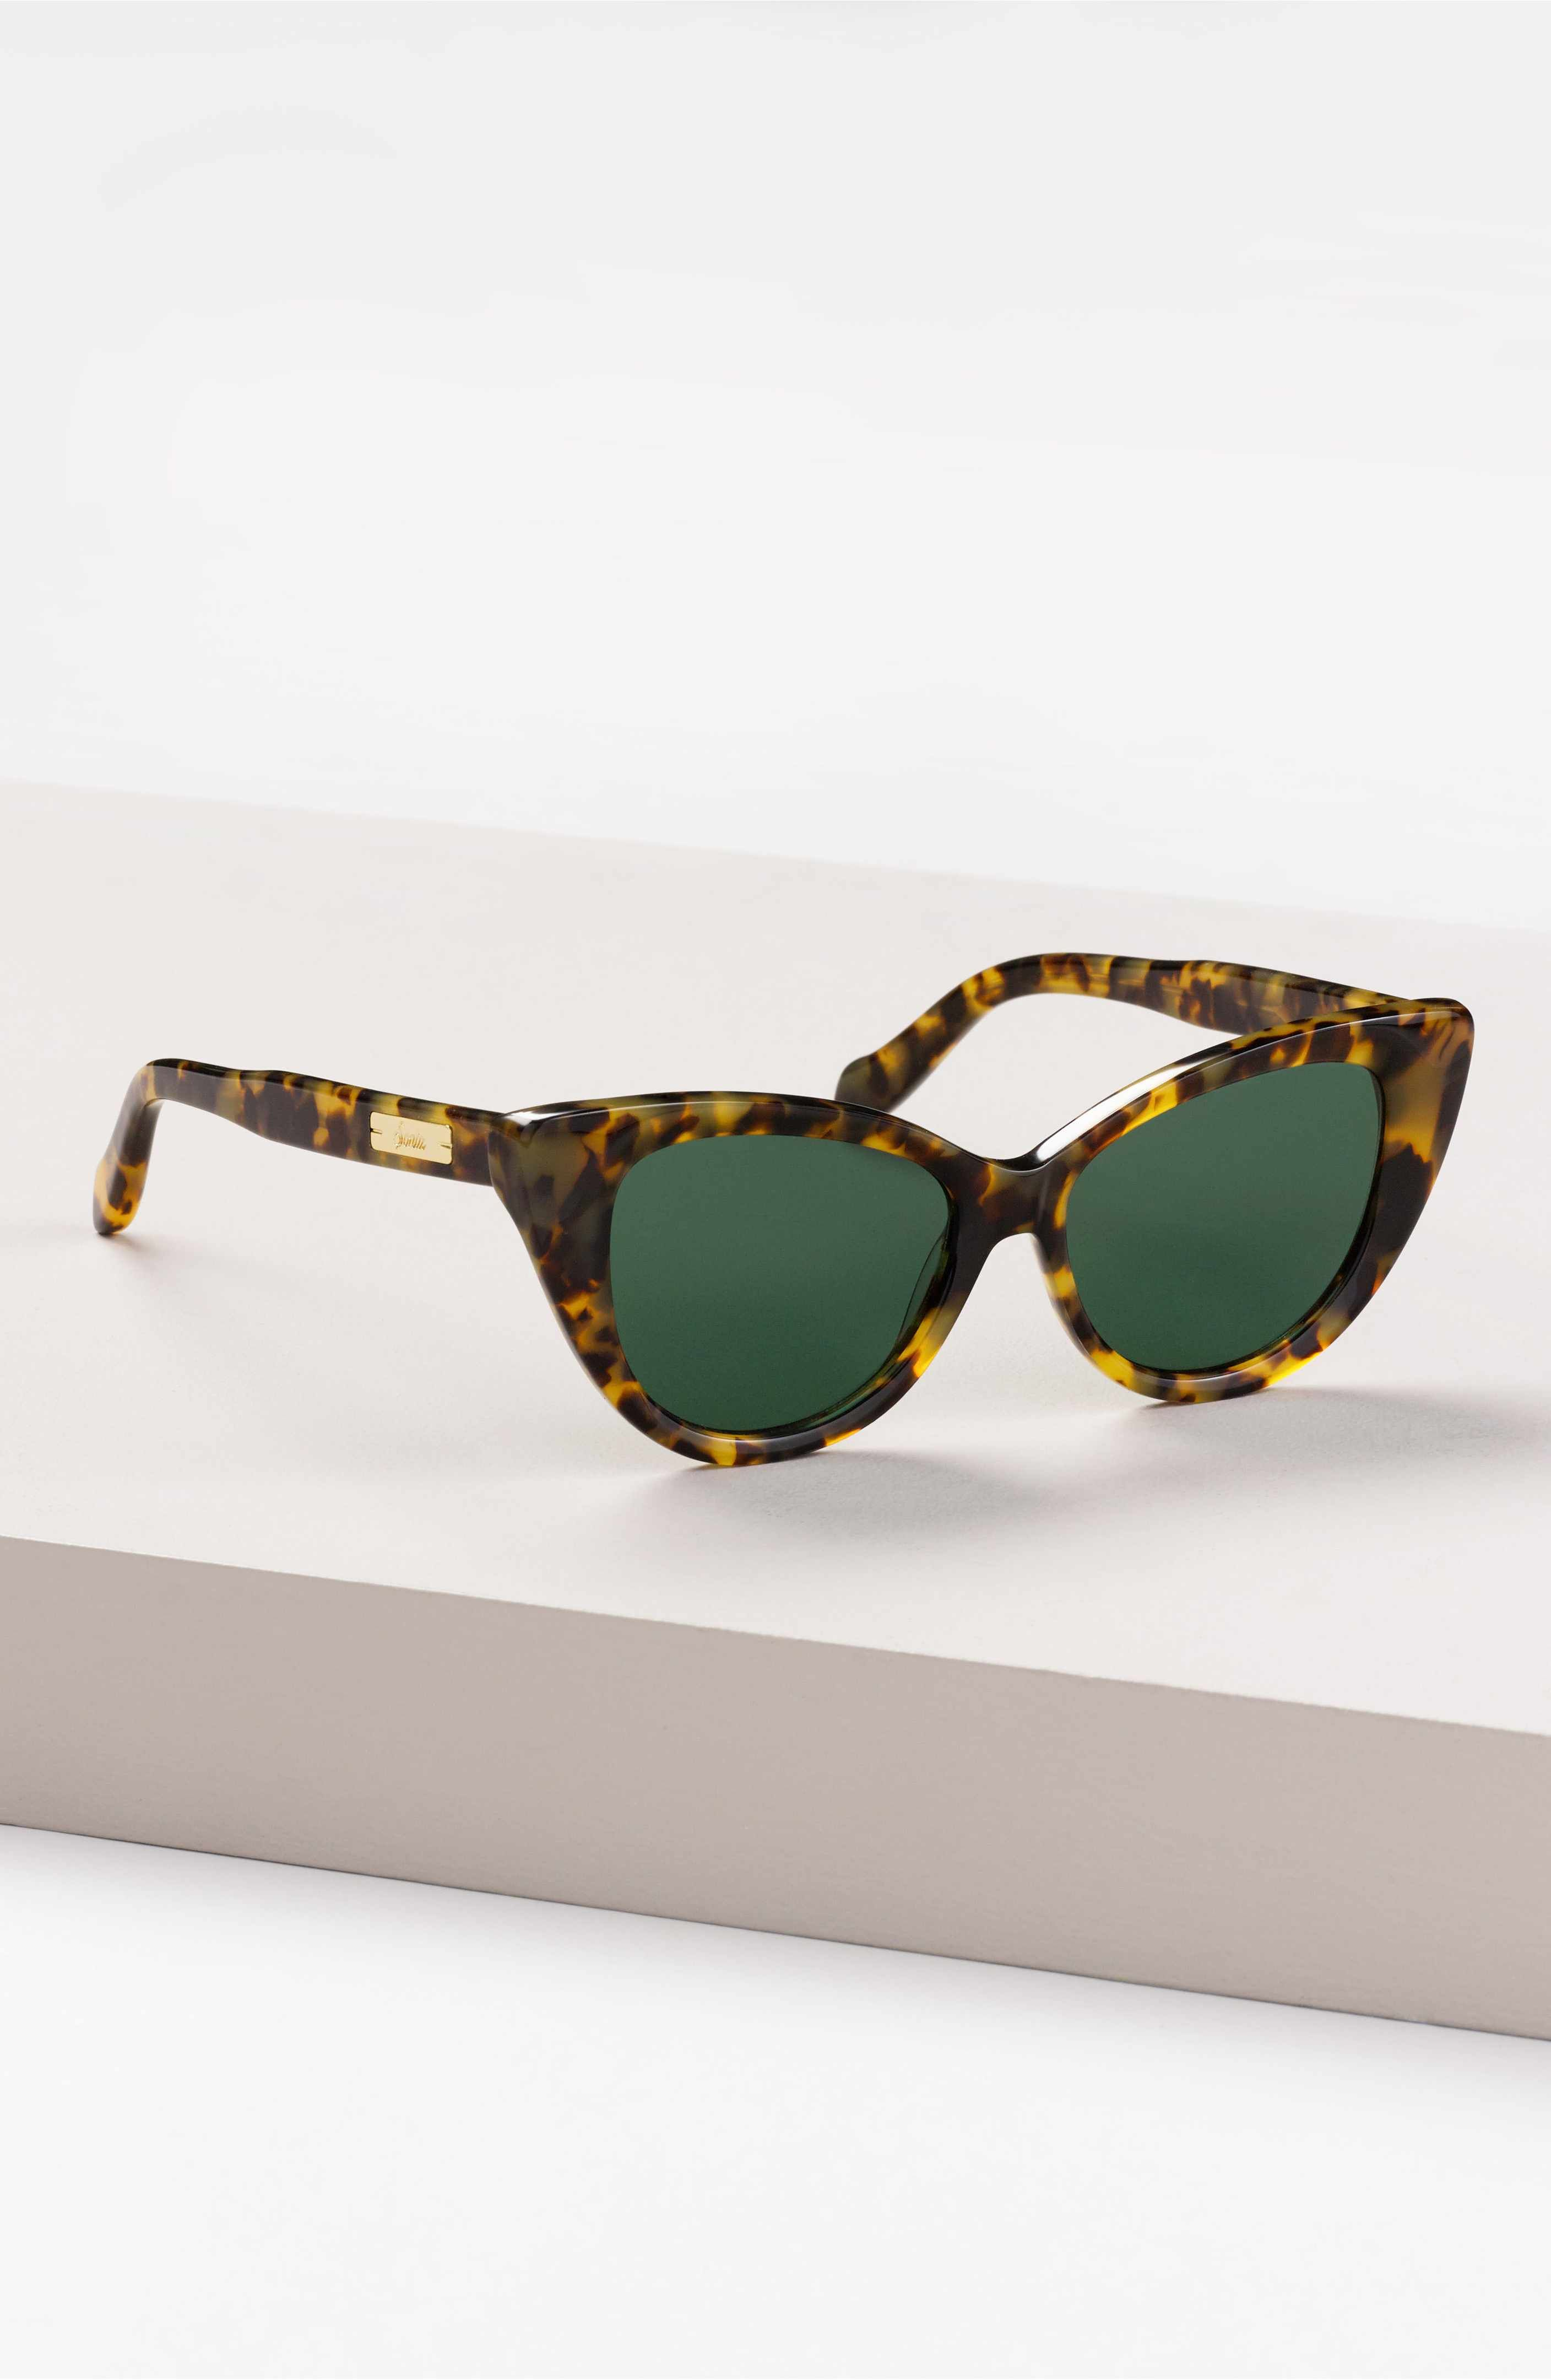 988e06834c97 Main Image - Sonix Kyoto 51mm Cat Eye Sunglasses